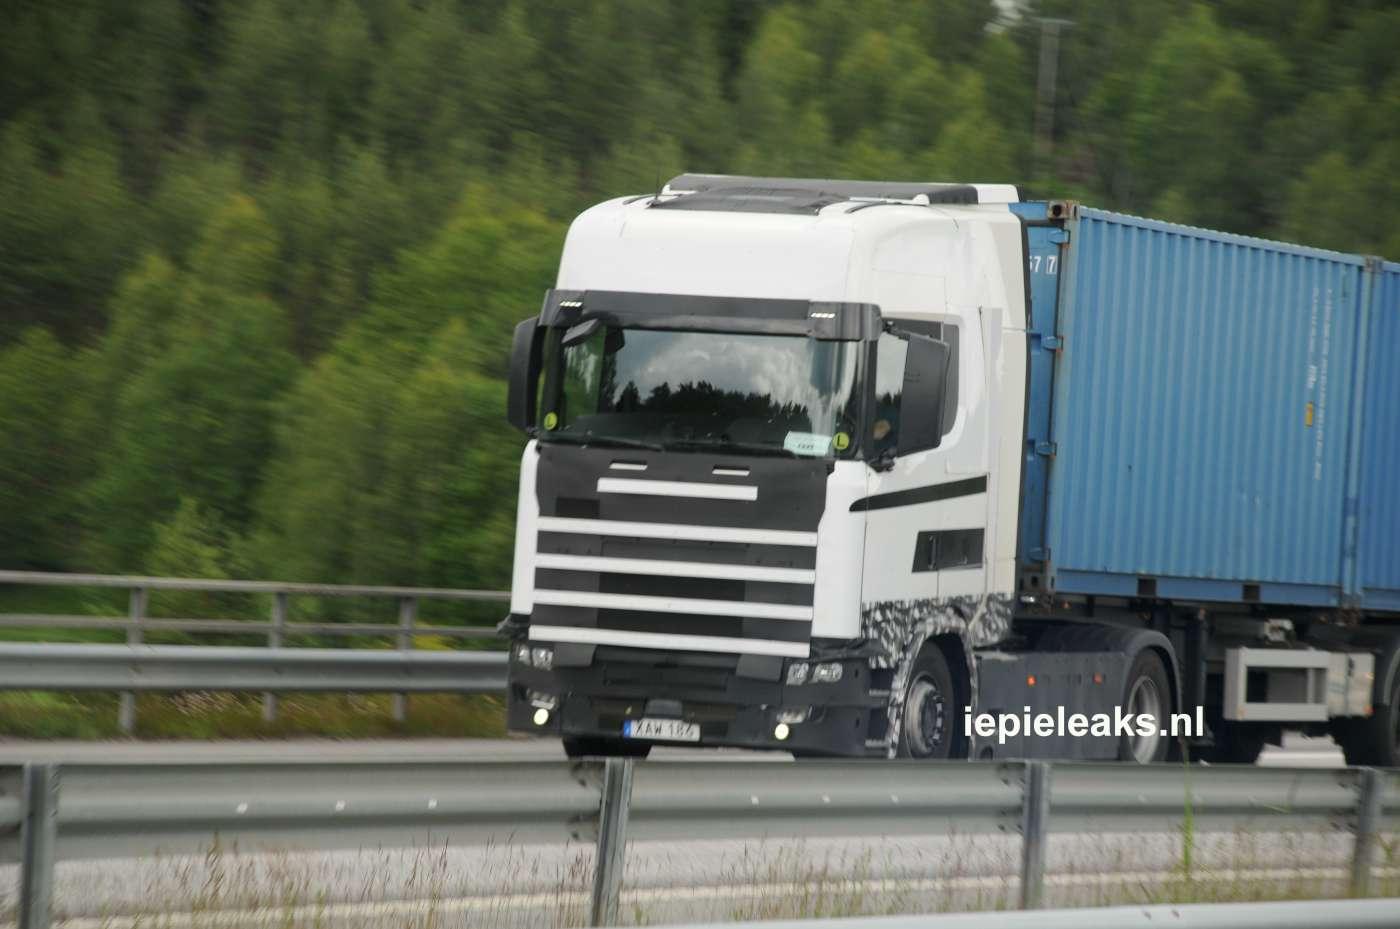 Next Scania: 780 Hp! – Iepieleaks